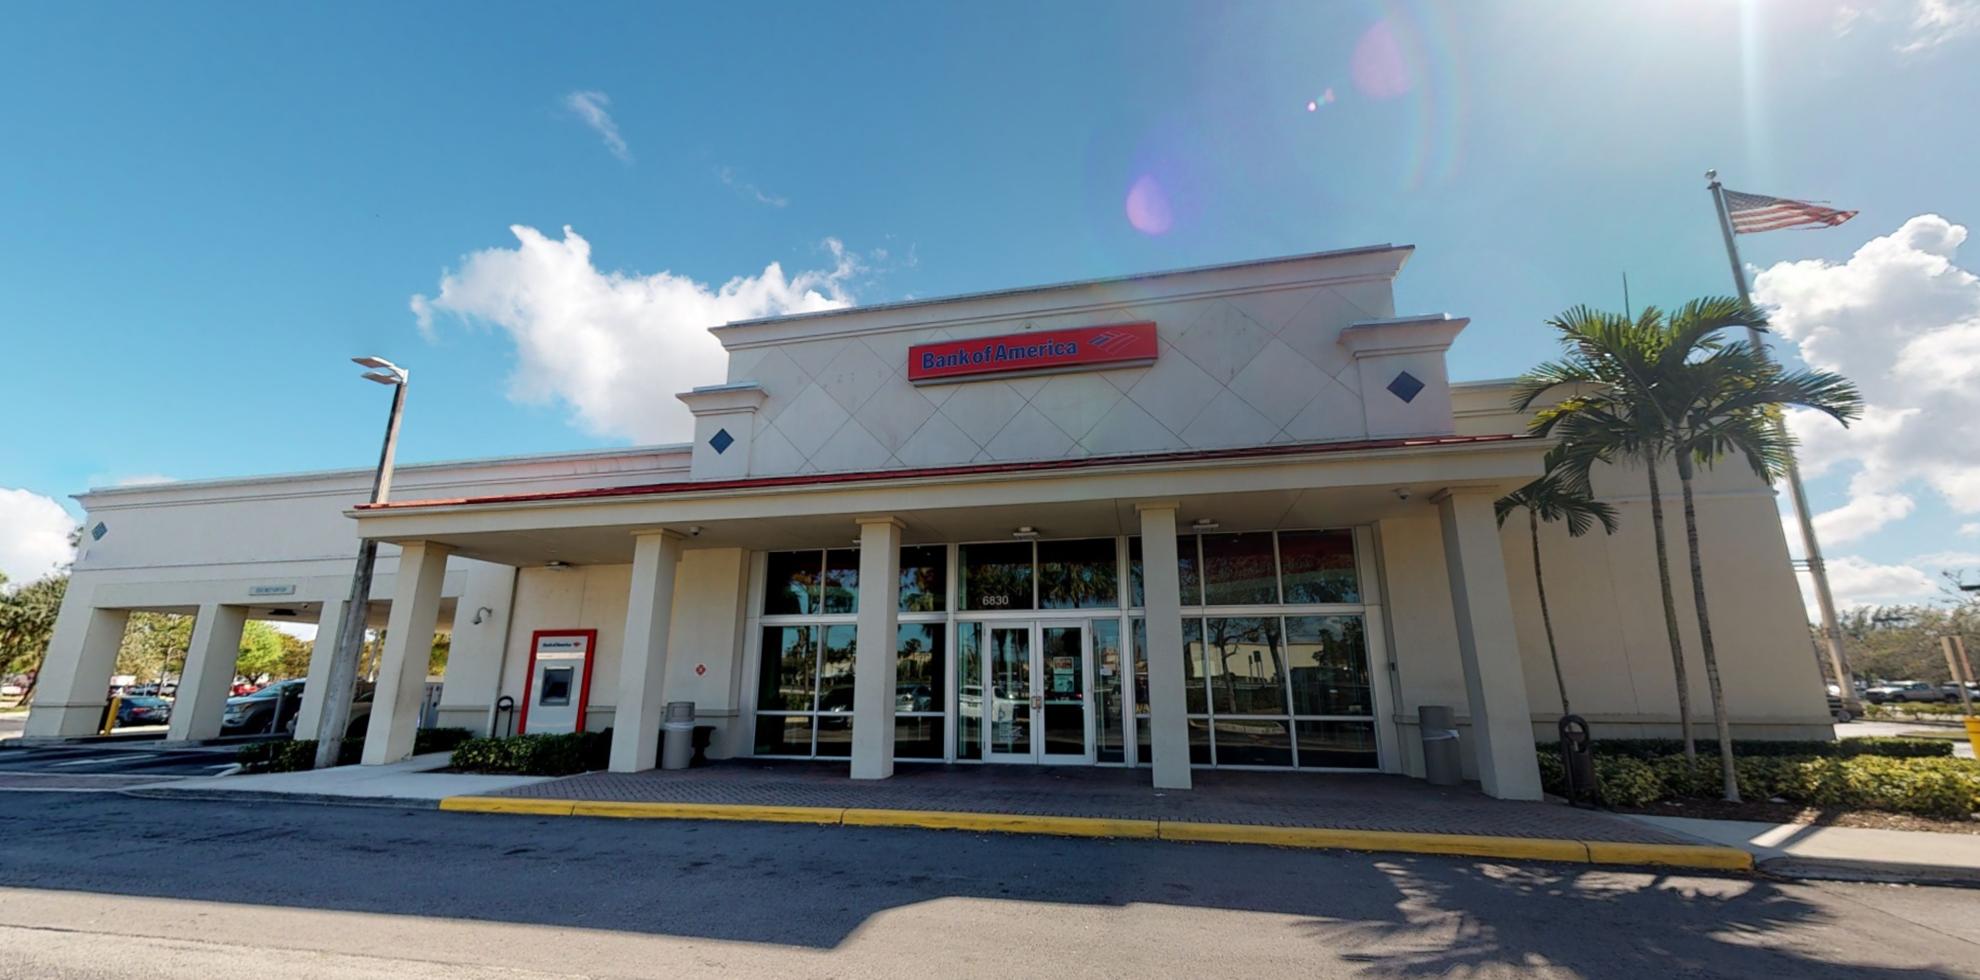 Bank of America financial center with drive-thru ATM   6830 Okeechobee Blvd, West Palm Beach, FL 33411